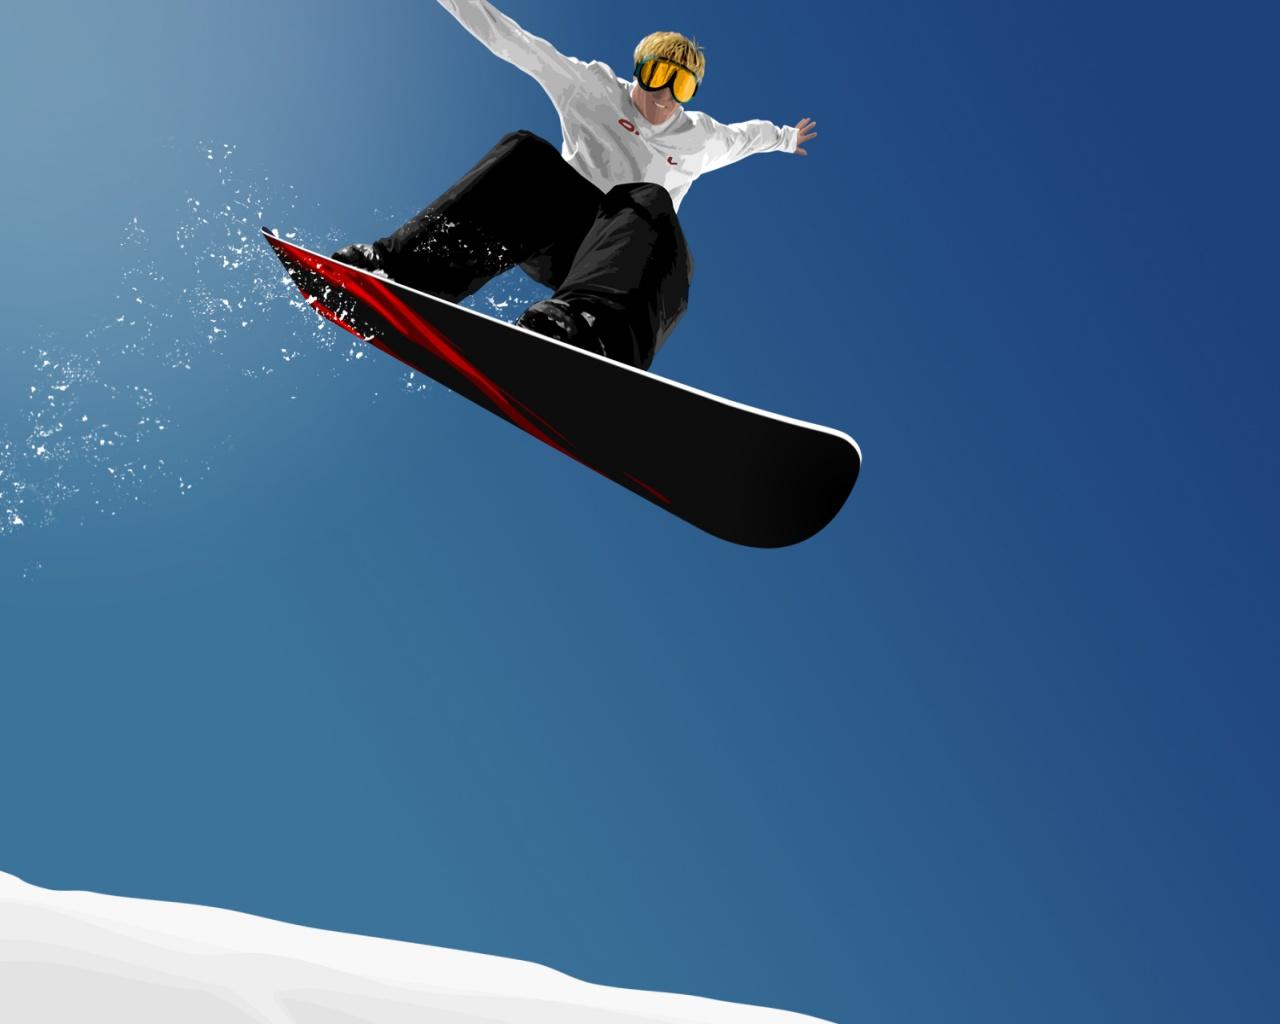 http://3.bp.blogspot.com/_TRodsnmN40M/S6pptCRGSaI/AAAAAAAAJ24/8VsfMSZzC3g/s1600/snowboarding-wallpapers_12628_1280x1024.jpg